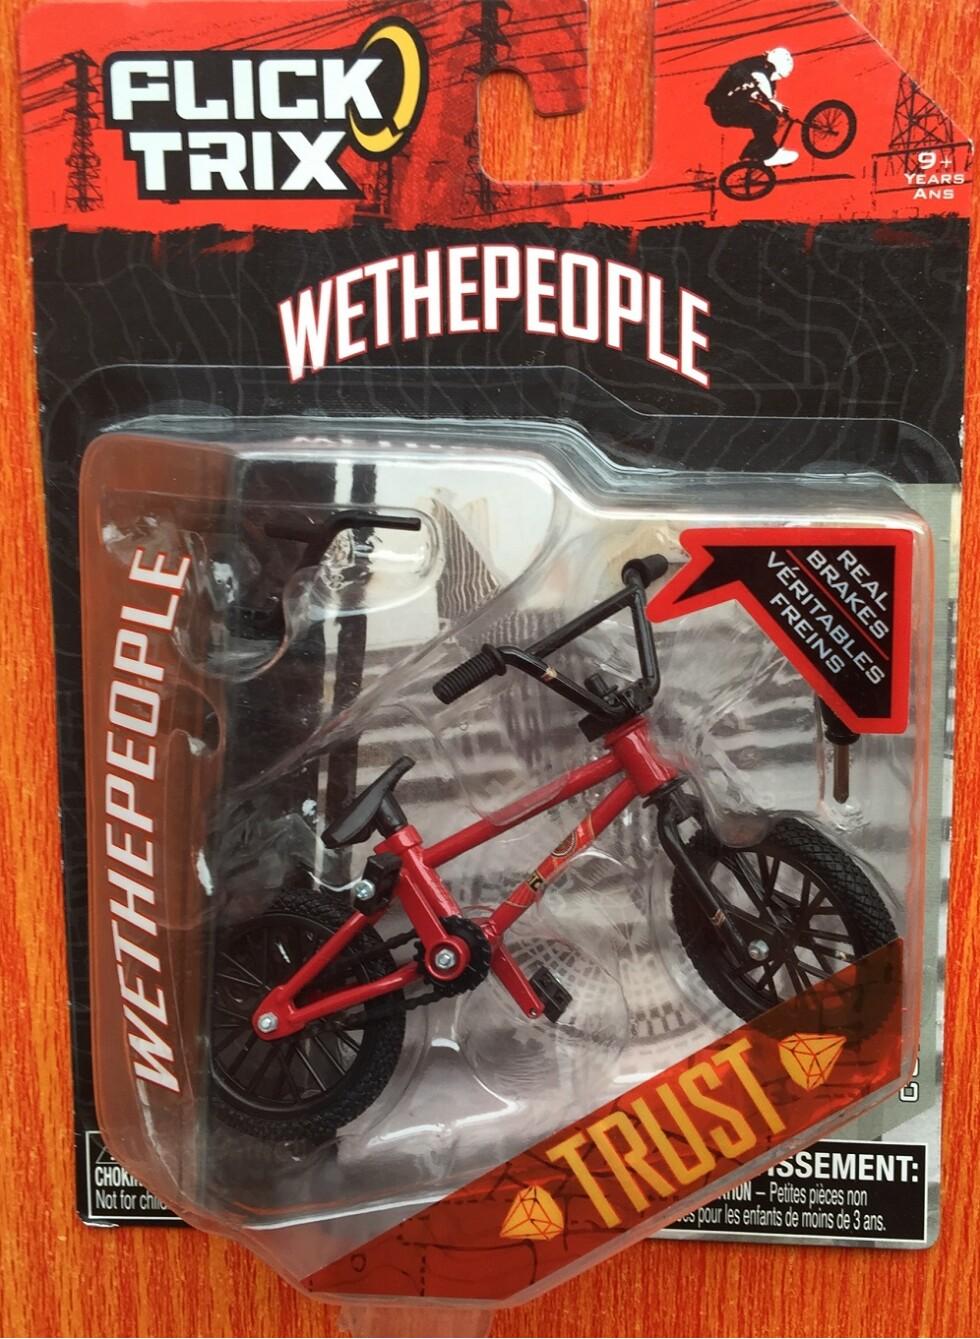 Flick Trix® Finger BMX Bike Toy